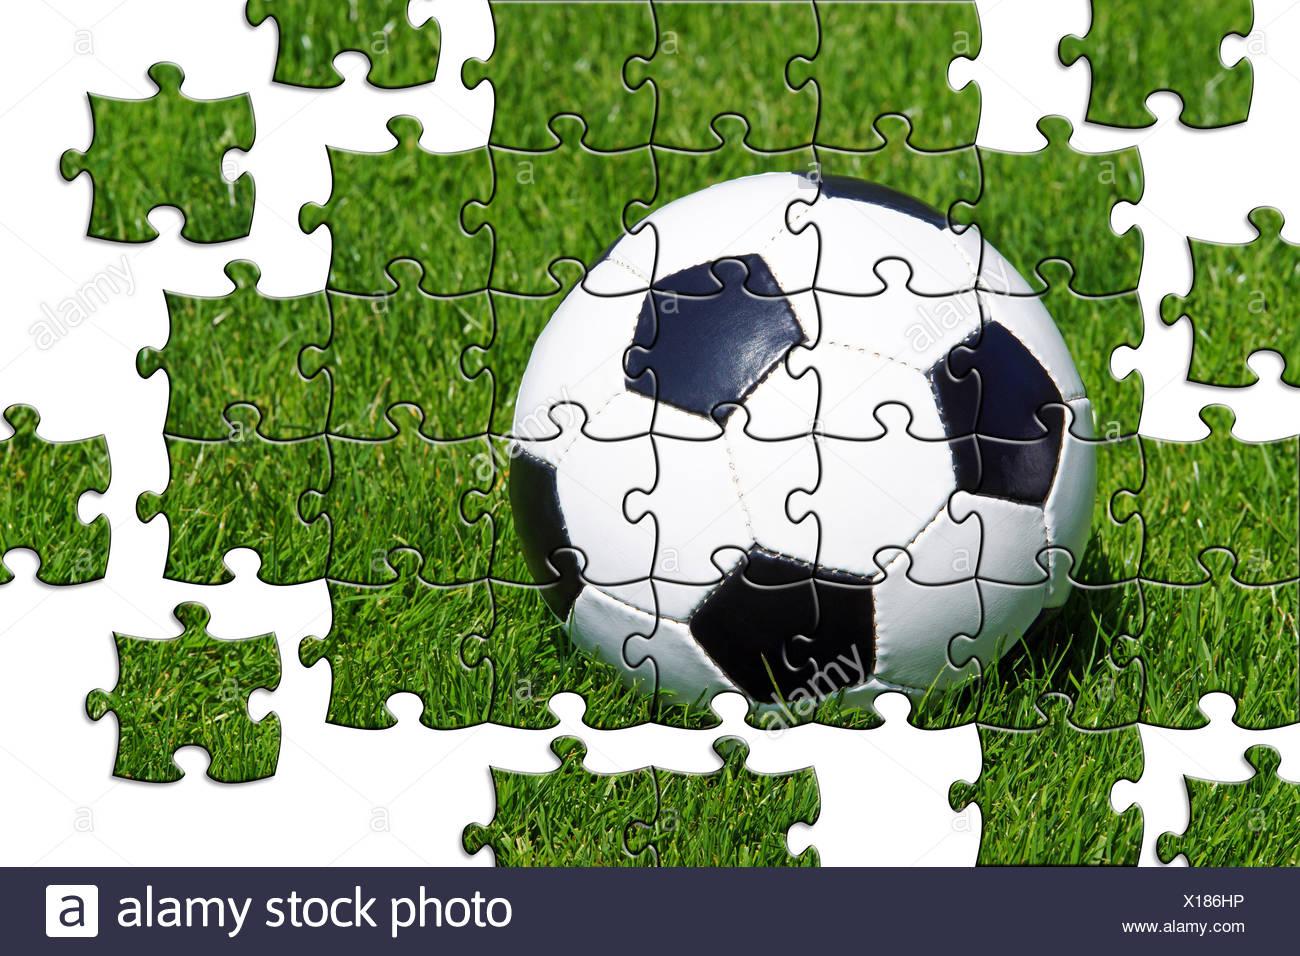 Fussball Puzzle Stockfoto Bild 276161362 Alamy